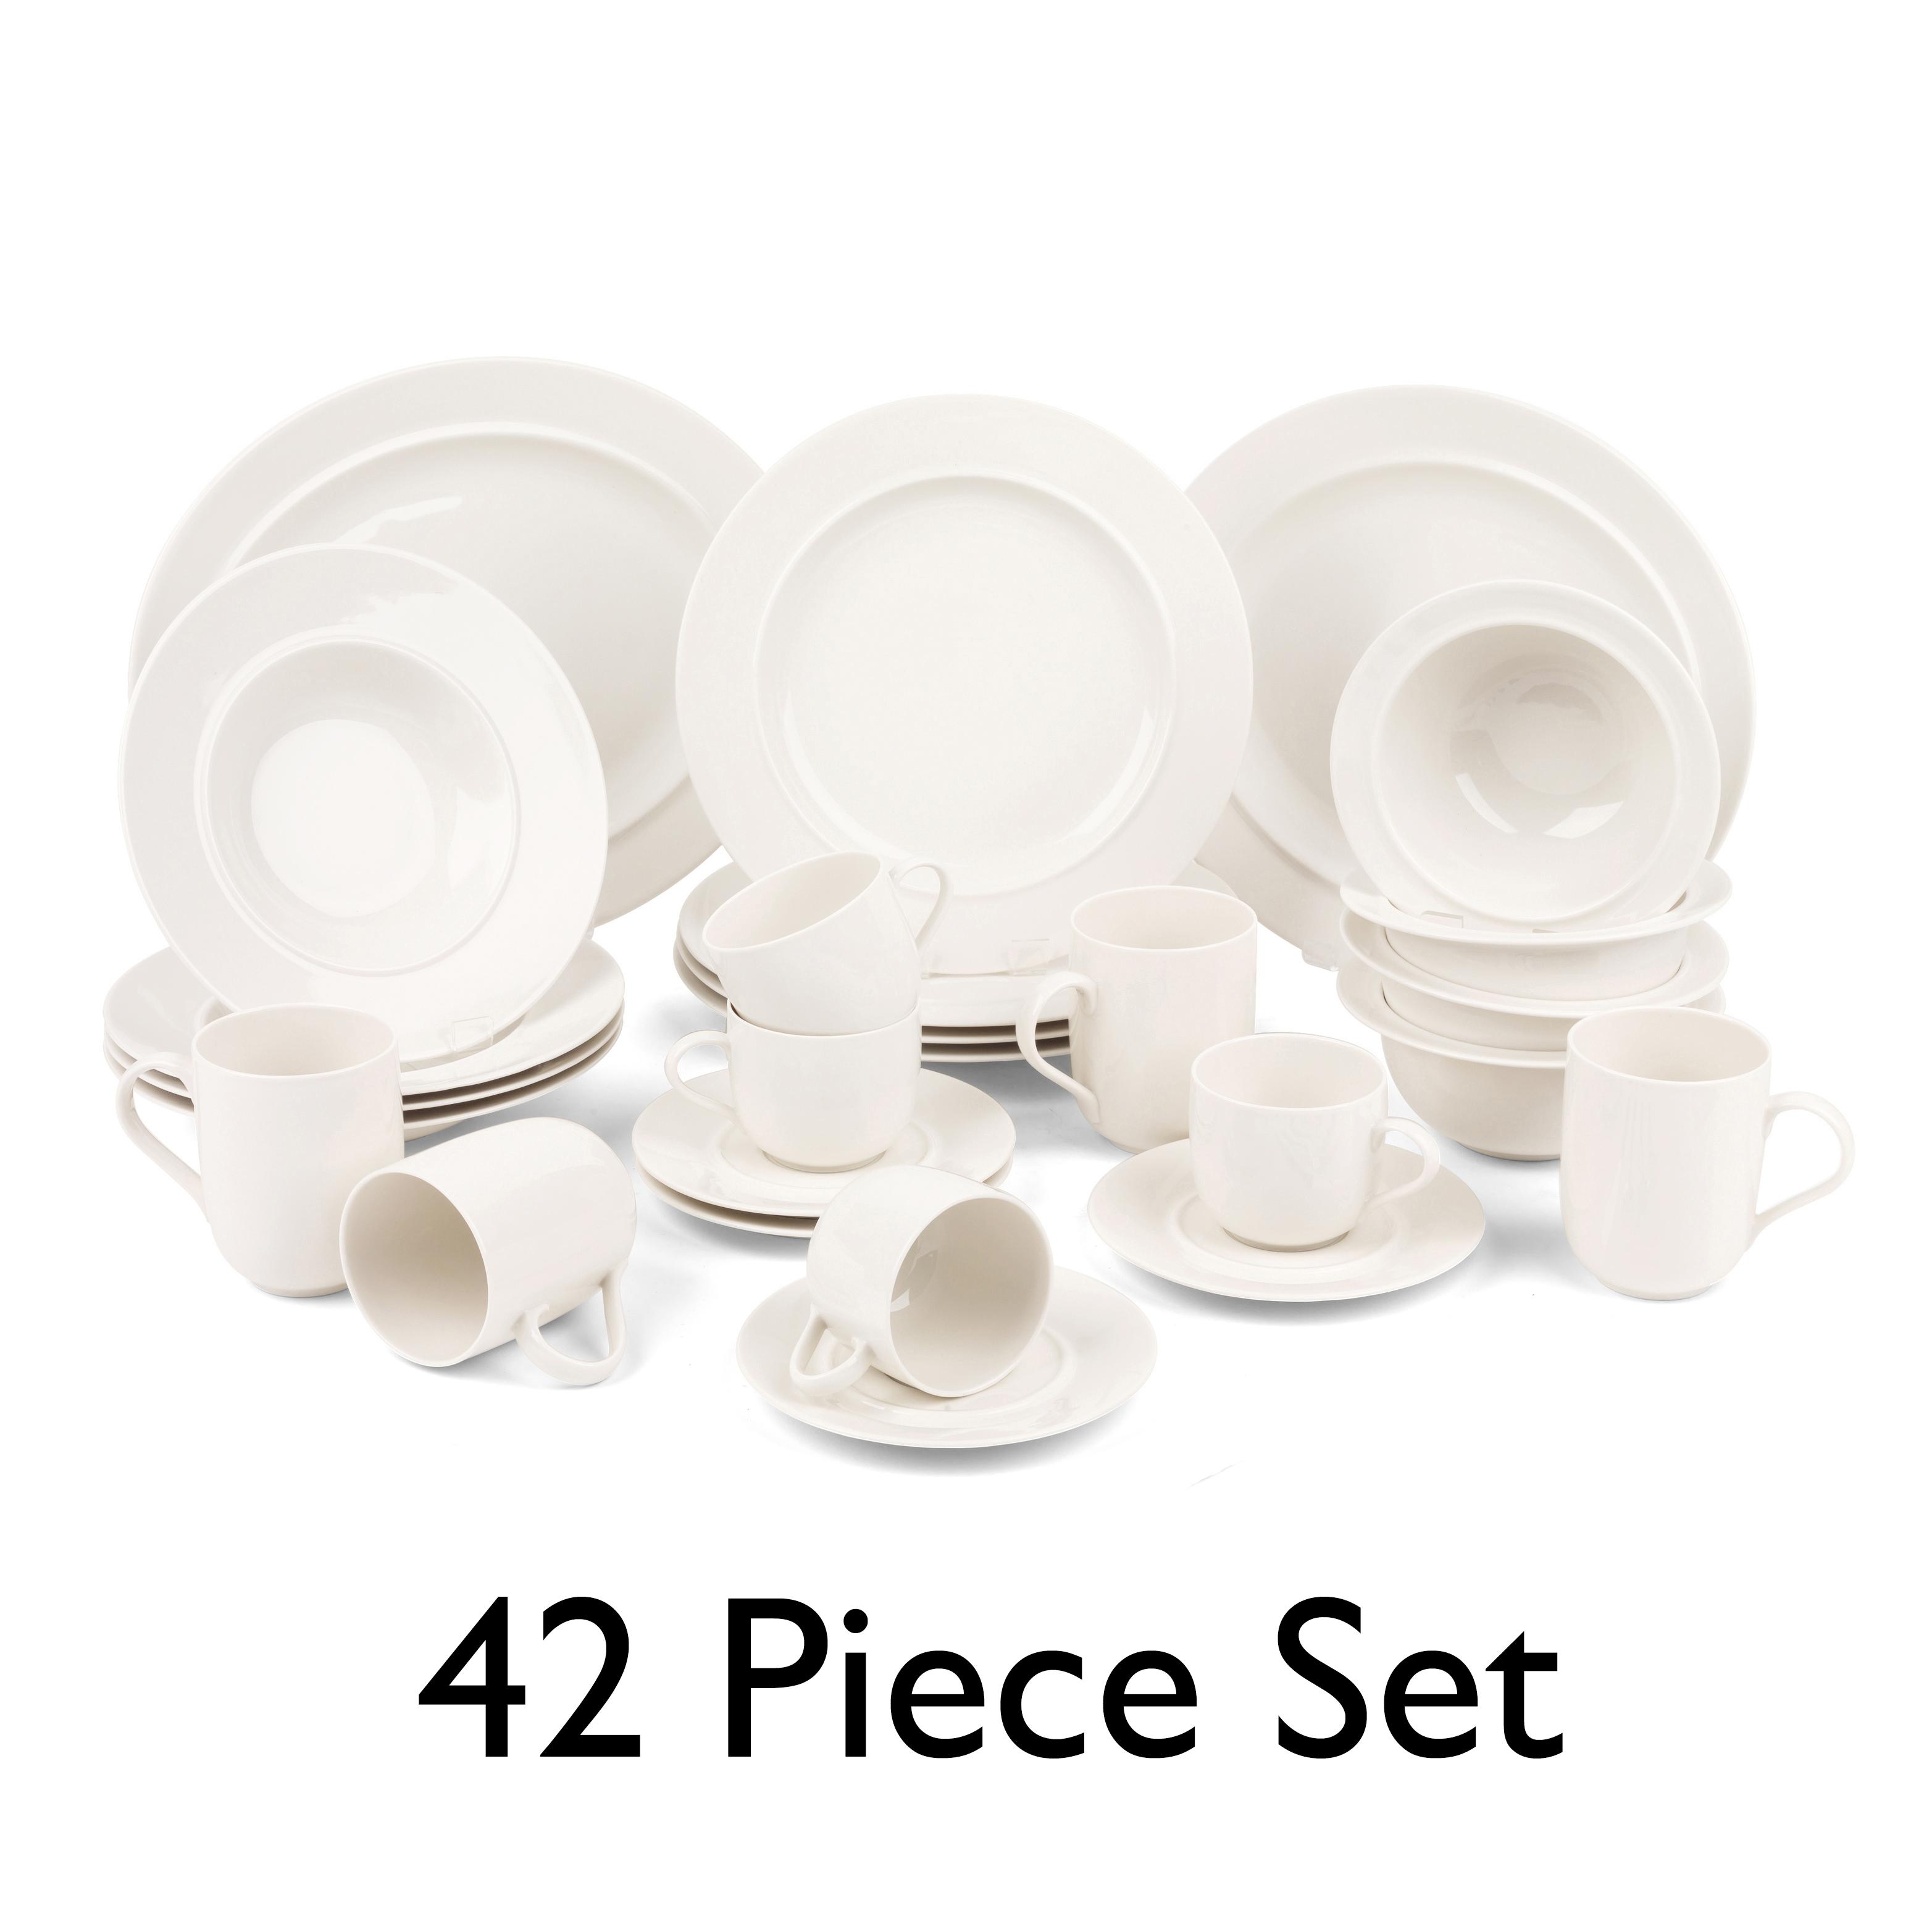 Alessi COMBO-3439 La Bella Tavola Porcelain Dinnerware Set, 42 Piece,  Service for 8 | Dishwasher Safe | For Domestic & Commercial Use